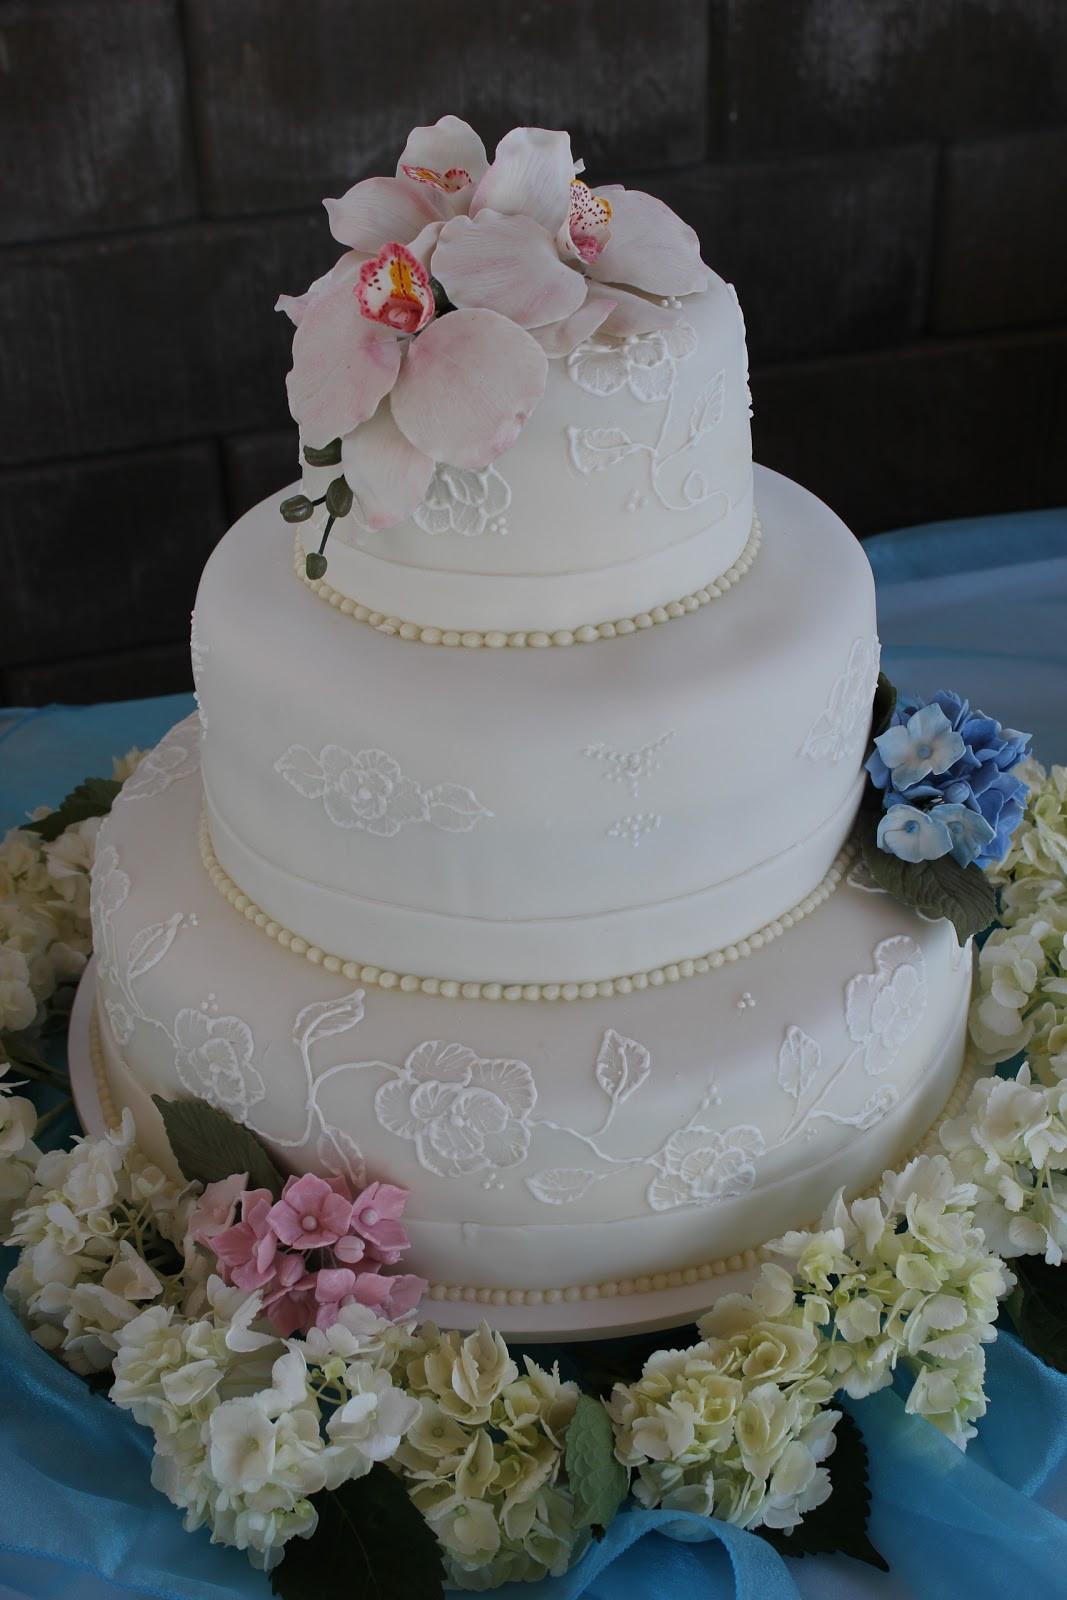 Hydrangeas Wedding Cakes  S A Cakes Hydrangea & Orchid Wedding Cake